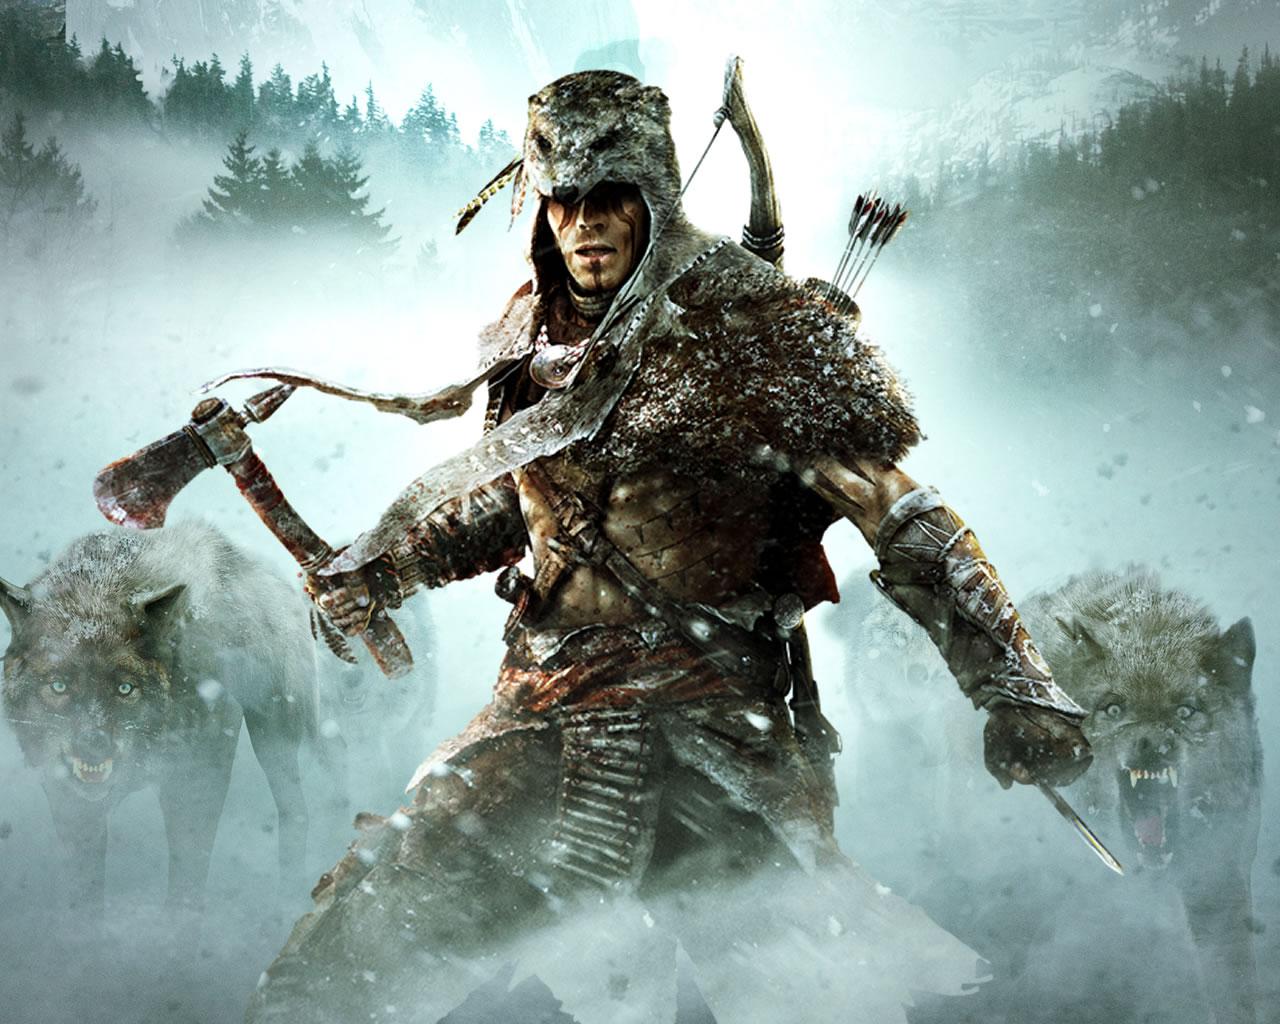 Wallpapers fond decran pour Assassins Creed III La Tyrannie du 1280x1024